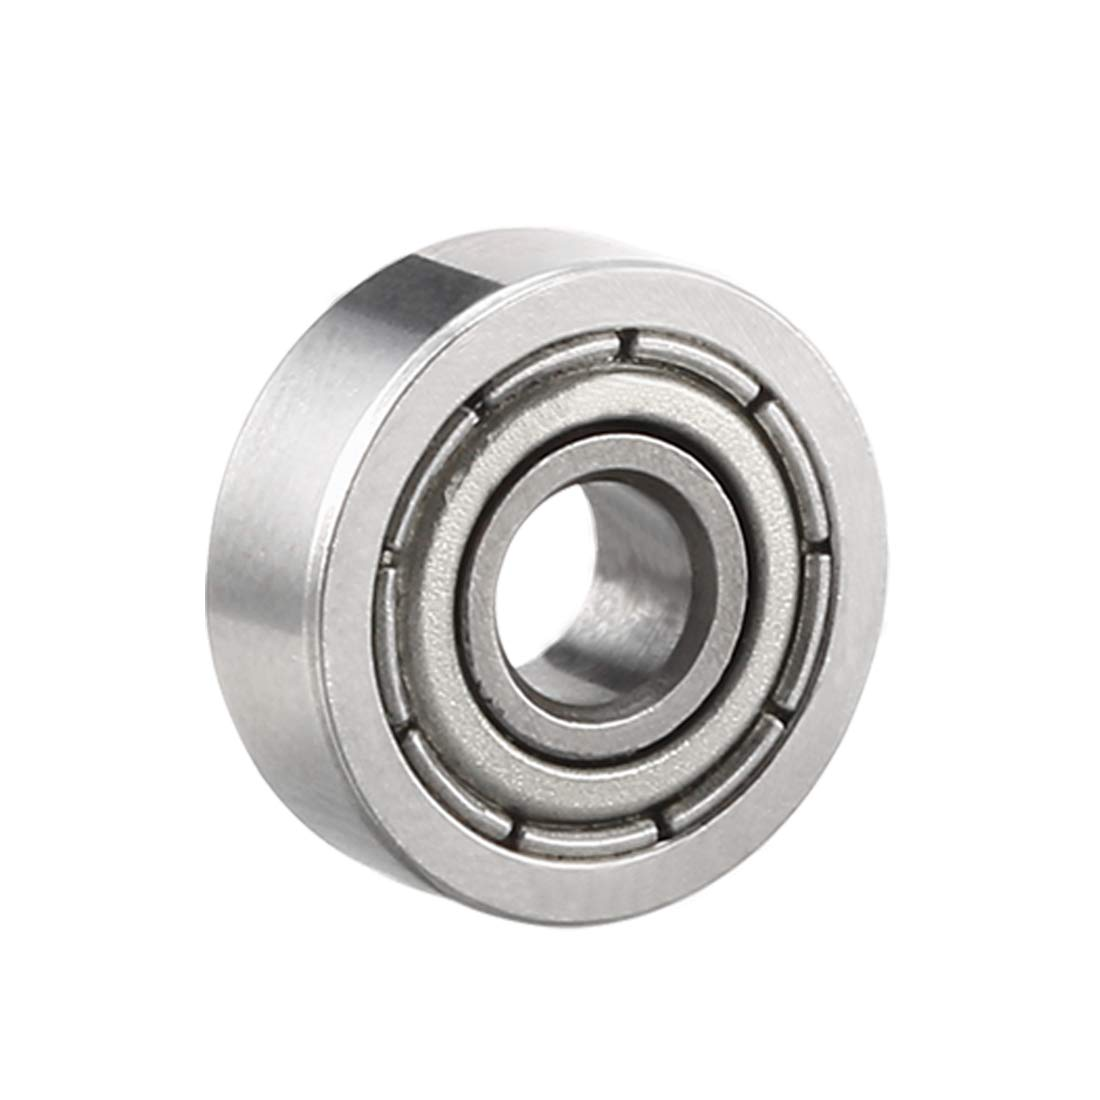 sourcing map 604ZZ Deep Groove Ball Bearing Double Shield 604-2Z 80014, 4mm x 12mm x 4mm Chrome Steel Bearings (10-Pack)